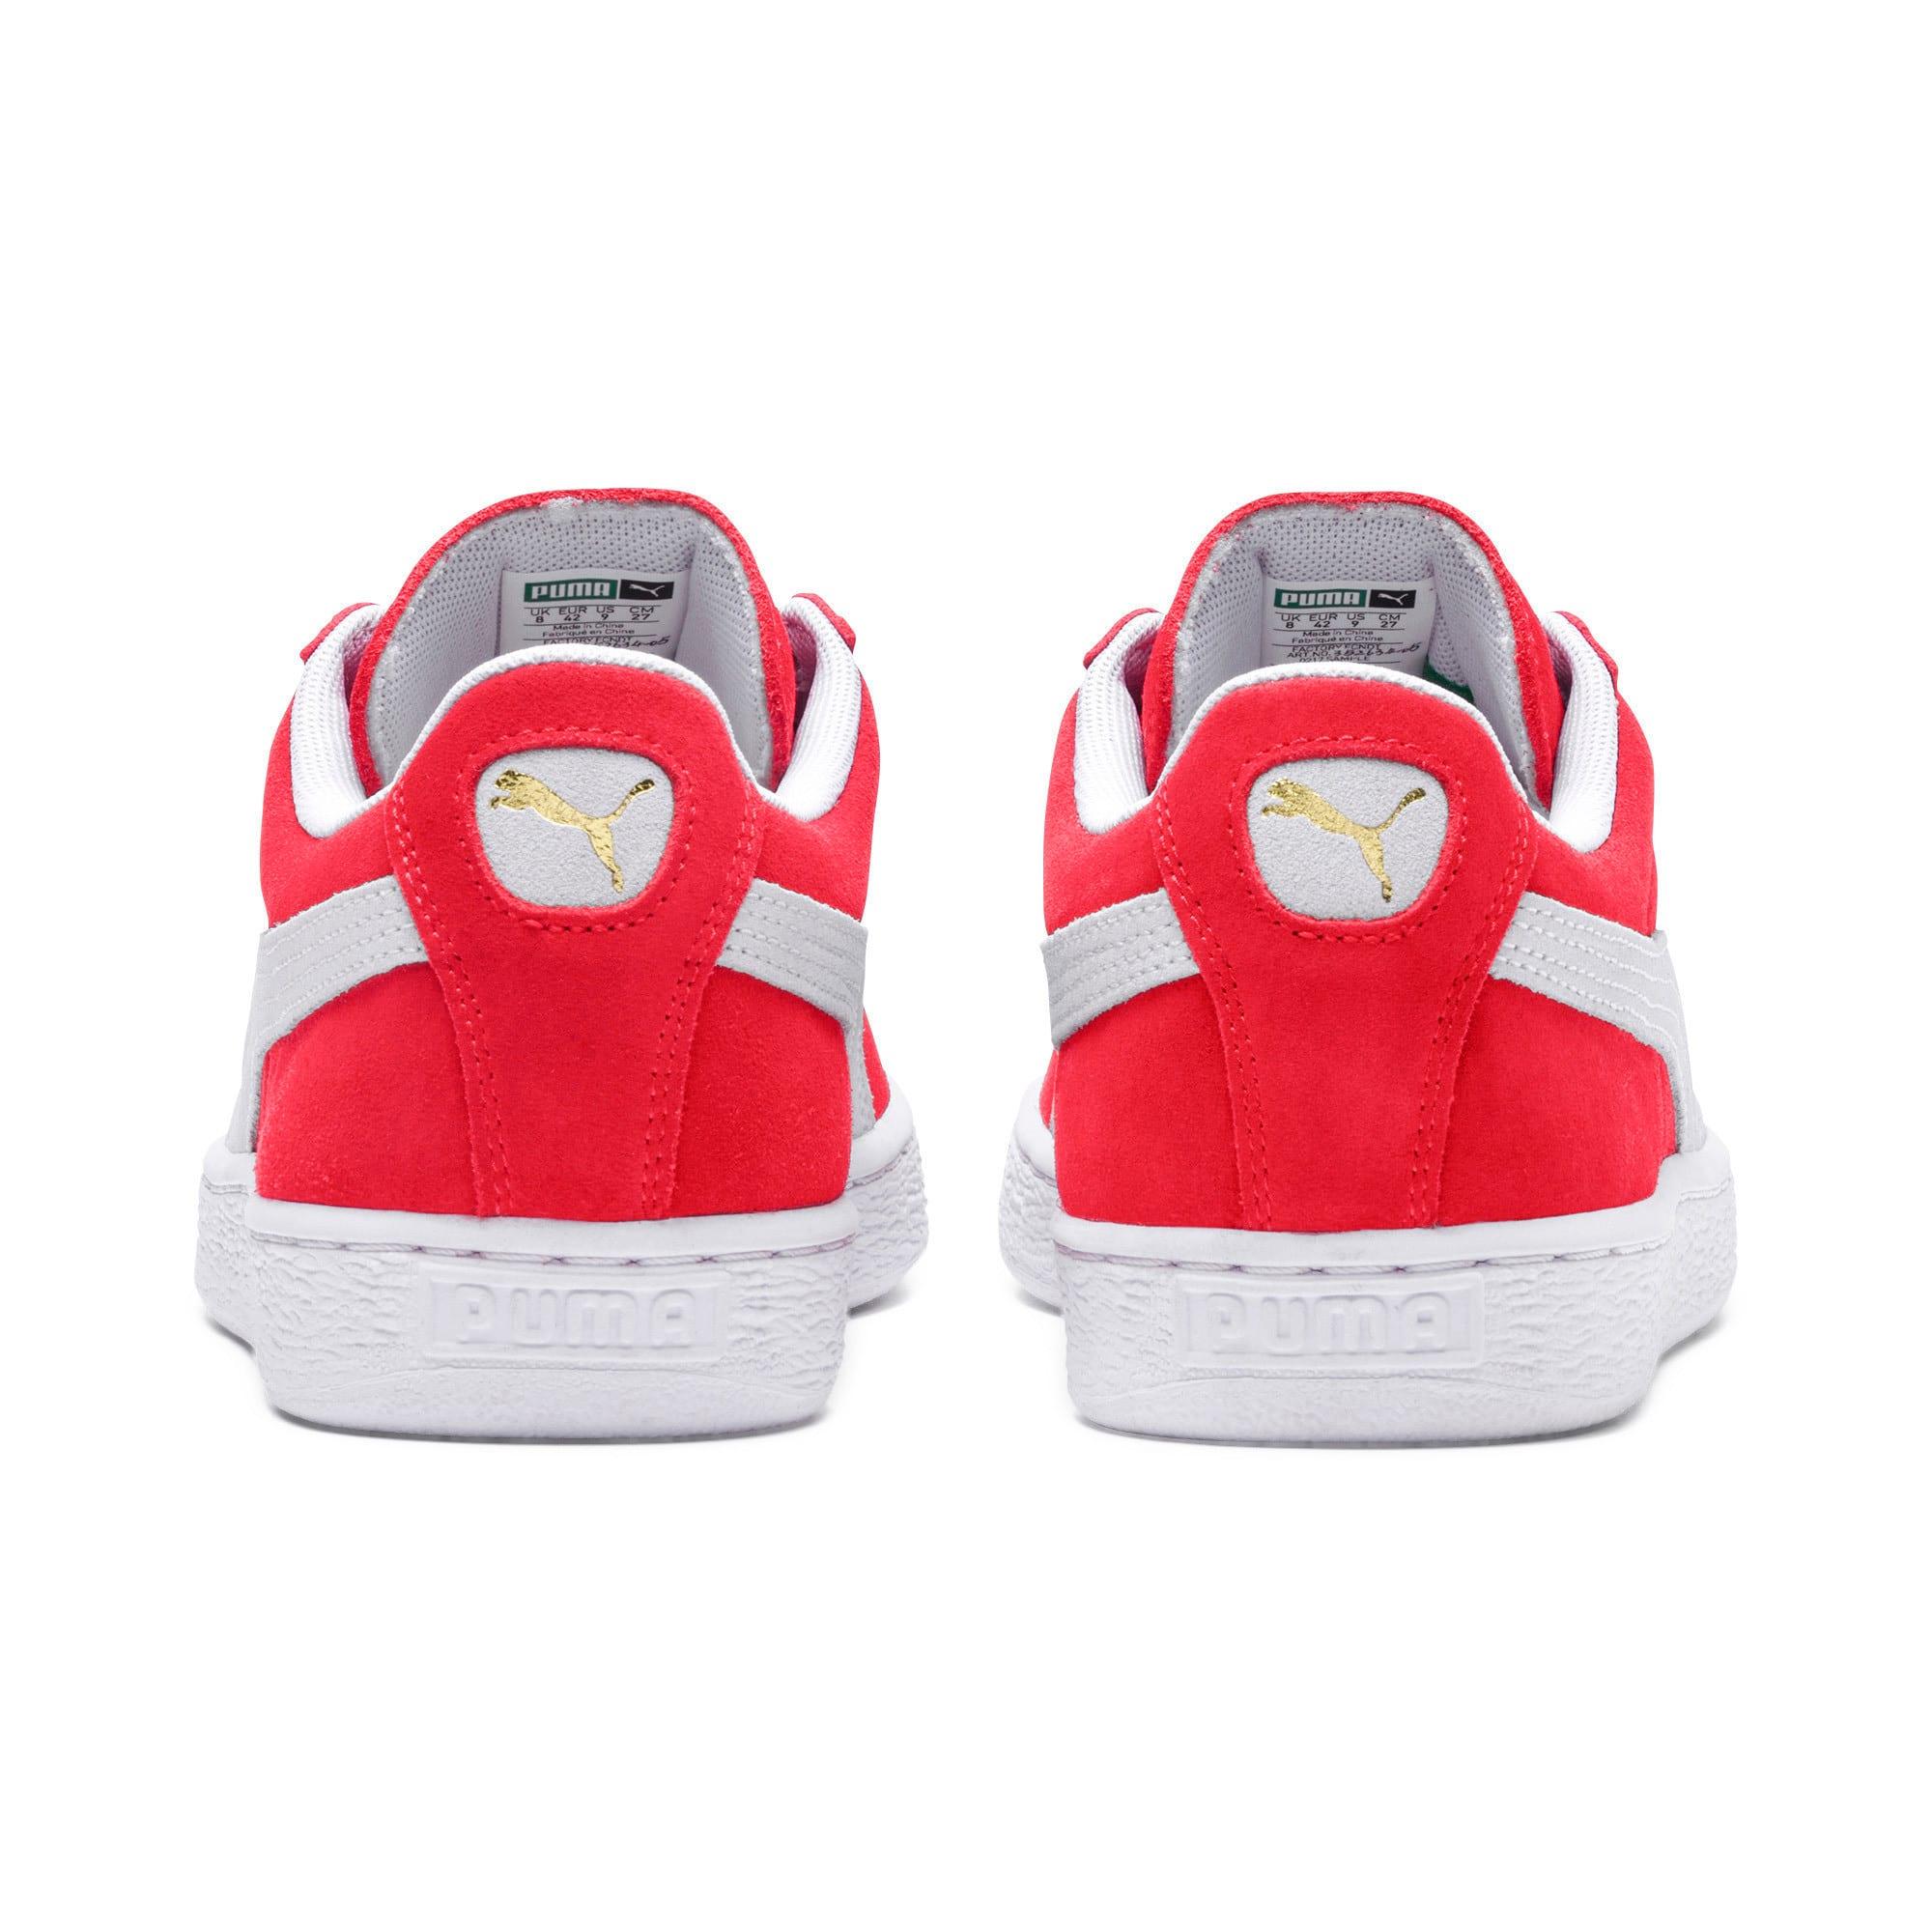 Miniatura 3 de Zapatos deportivos clásicos de gamuza, team regal red-white, mediano